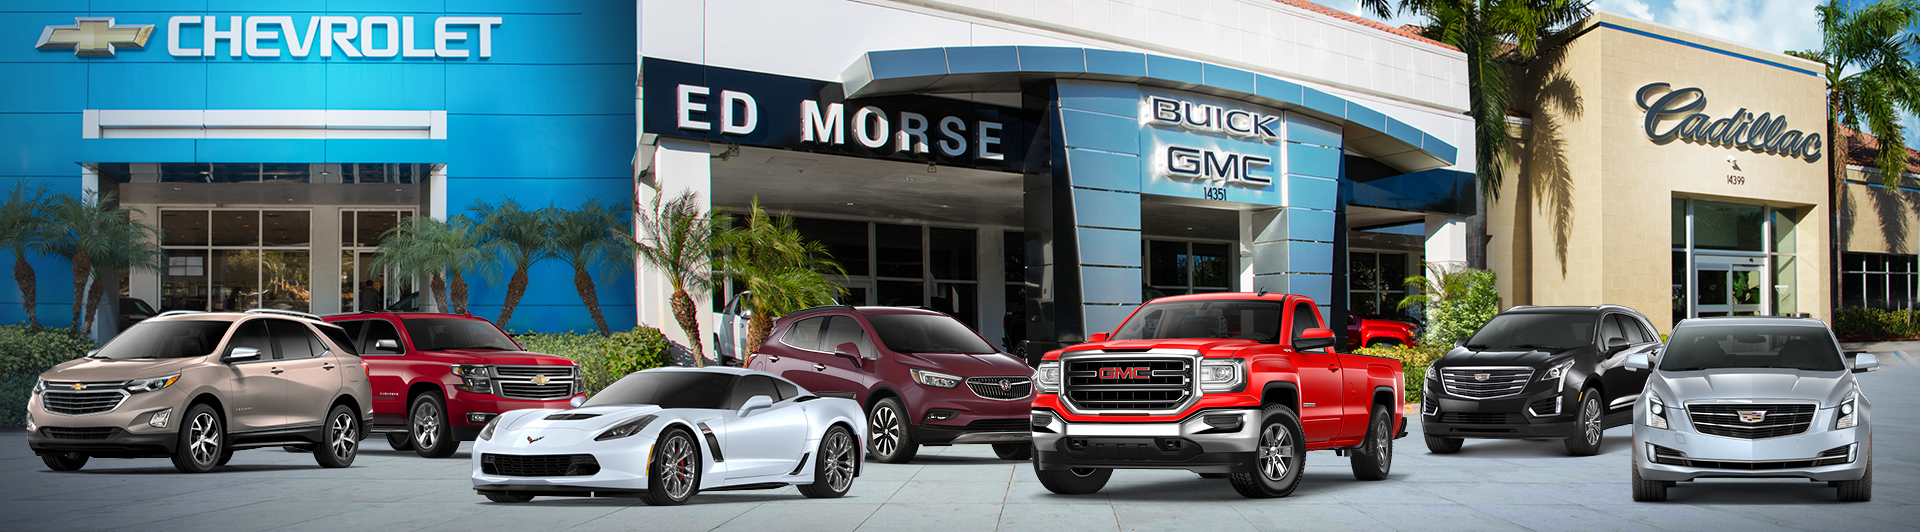 Ed Morse Sawgrass Automall